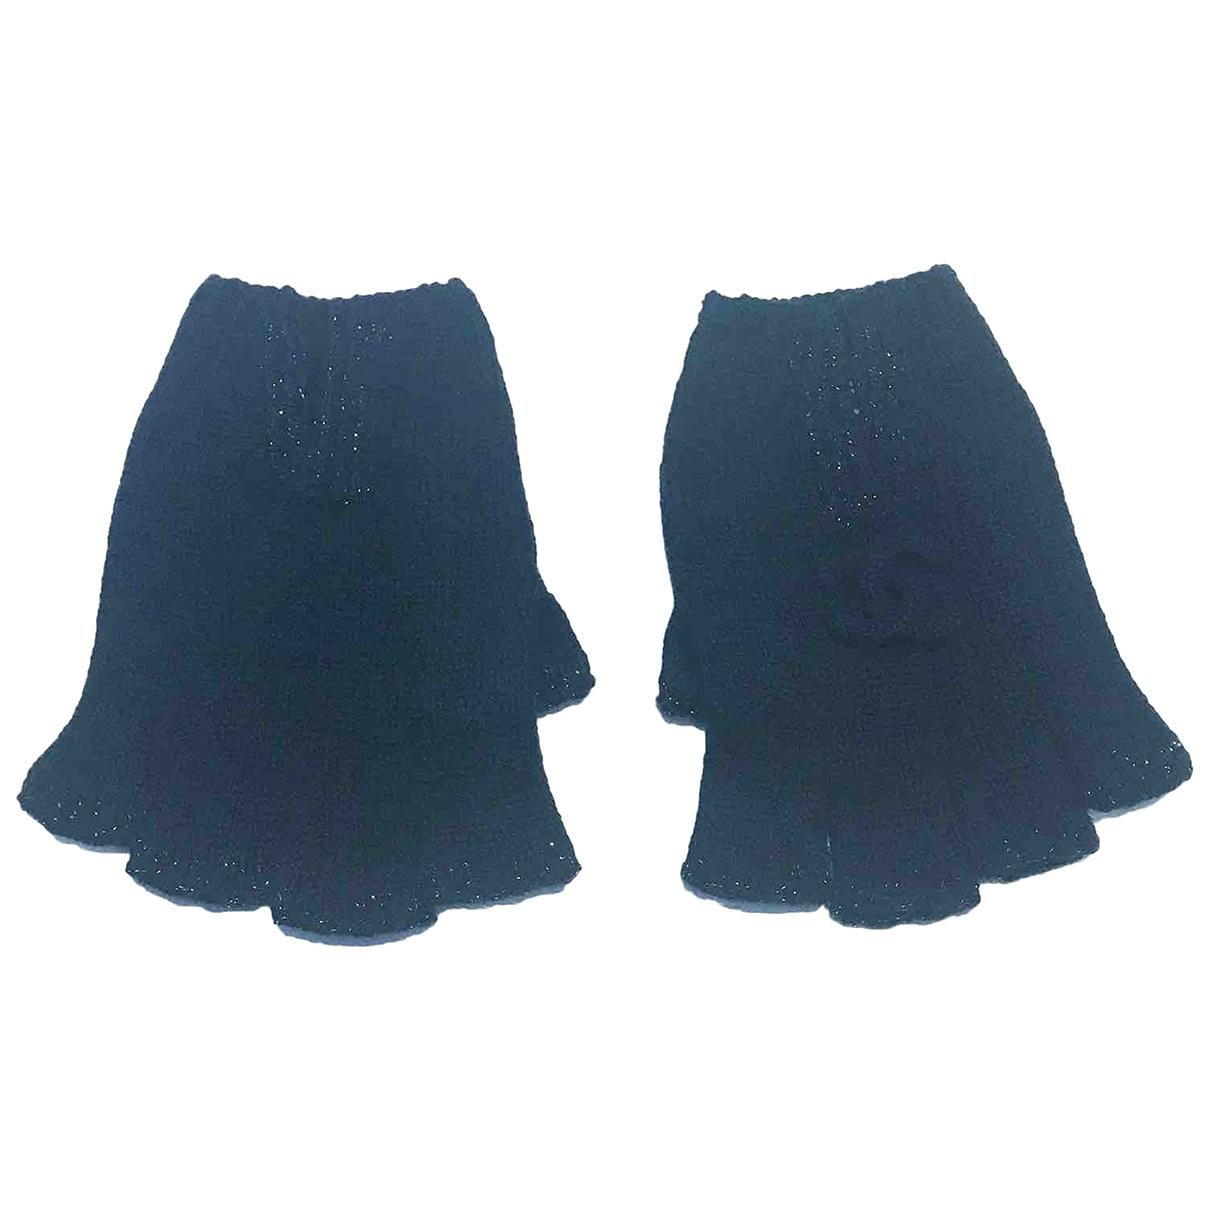 Chanel \N Blue Cashmere Gloves for Women S International